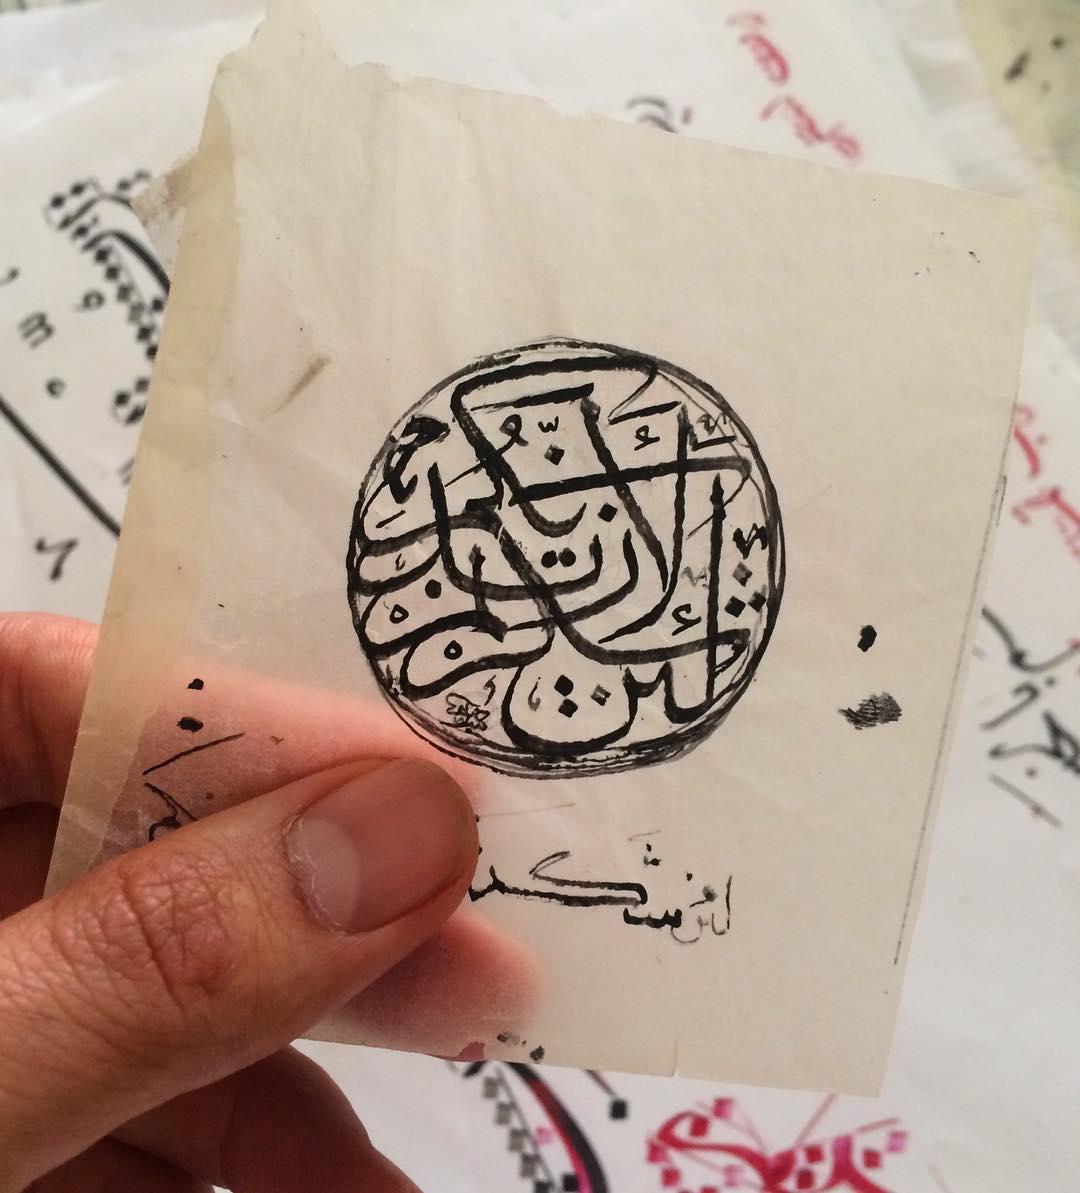 Karya Kaligrafi اعملوا آل دَاوُدَ شكرًا … من التراكيب القديمة ، بارك الله في أوقاتكم…- jasssim Meraj